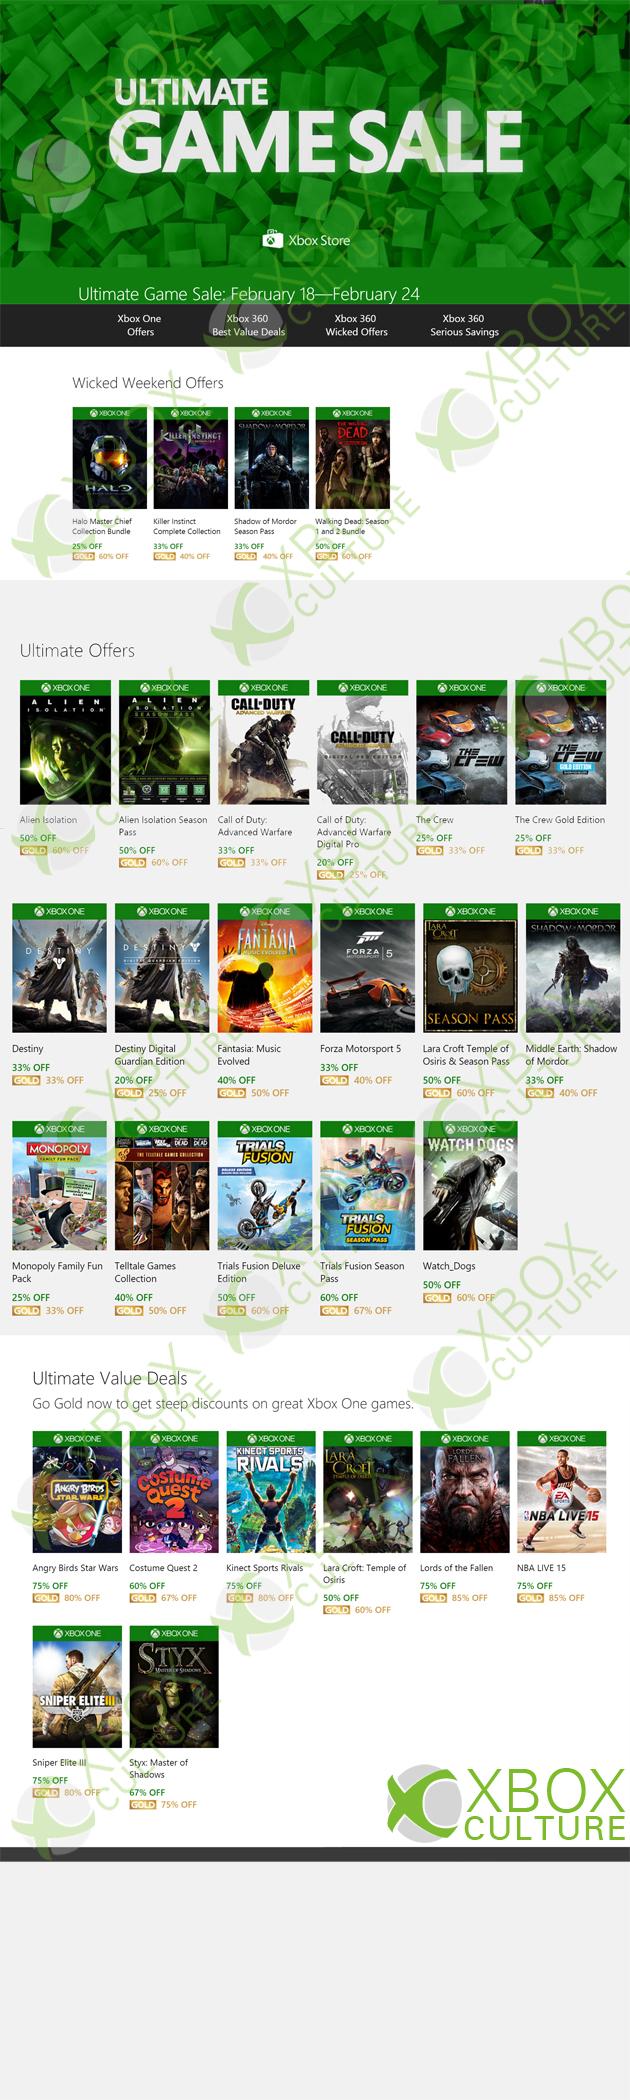 ultimatesale_XboxCultureCom